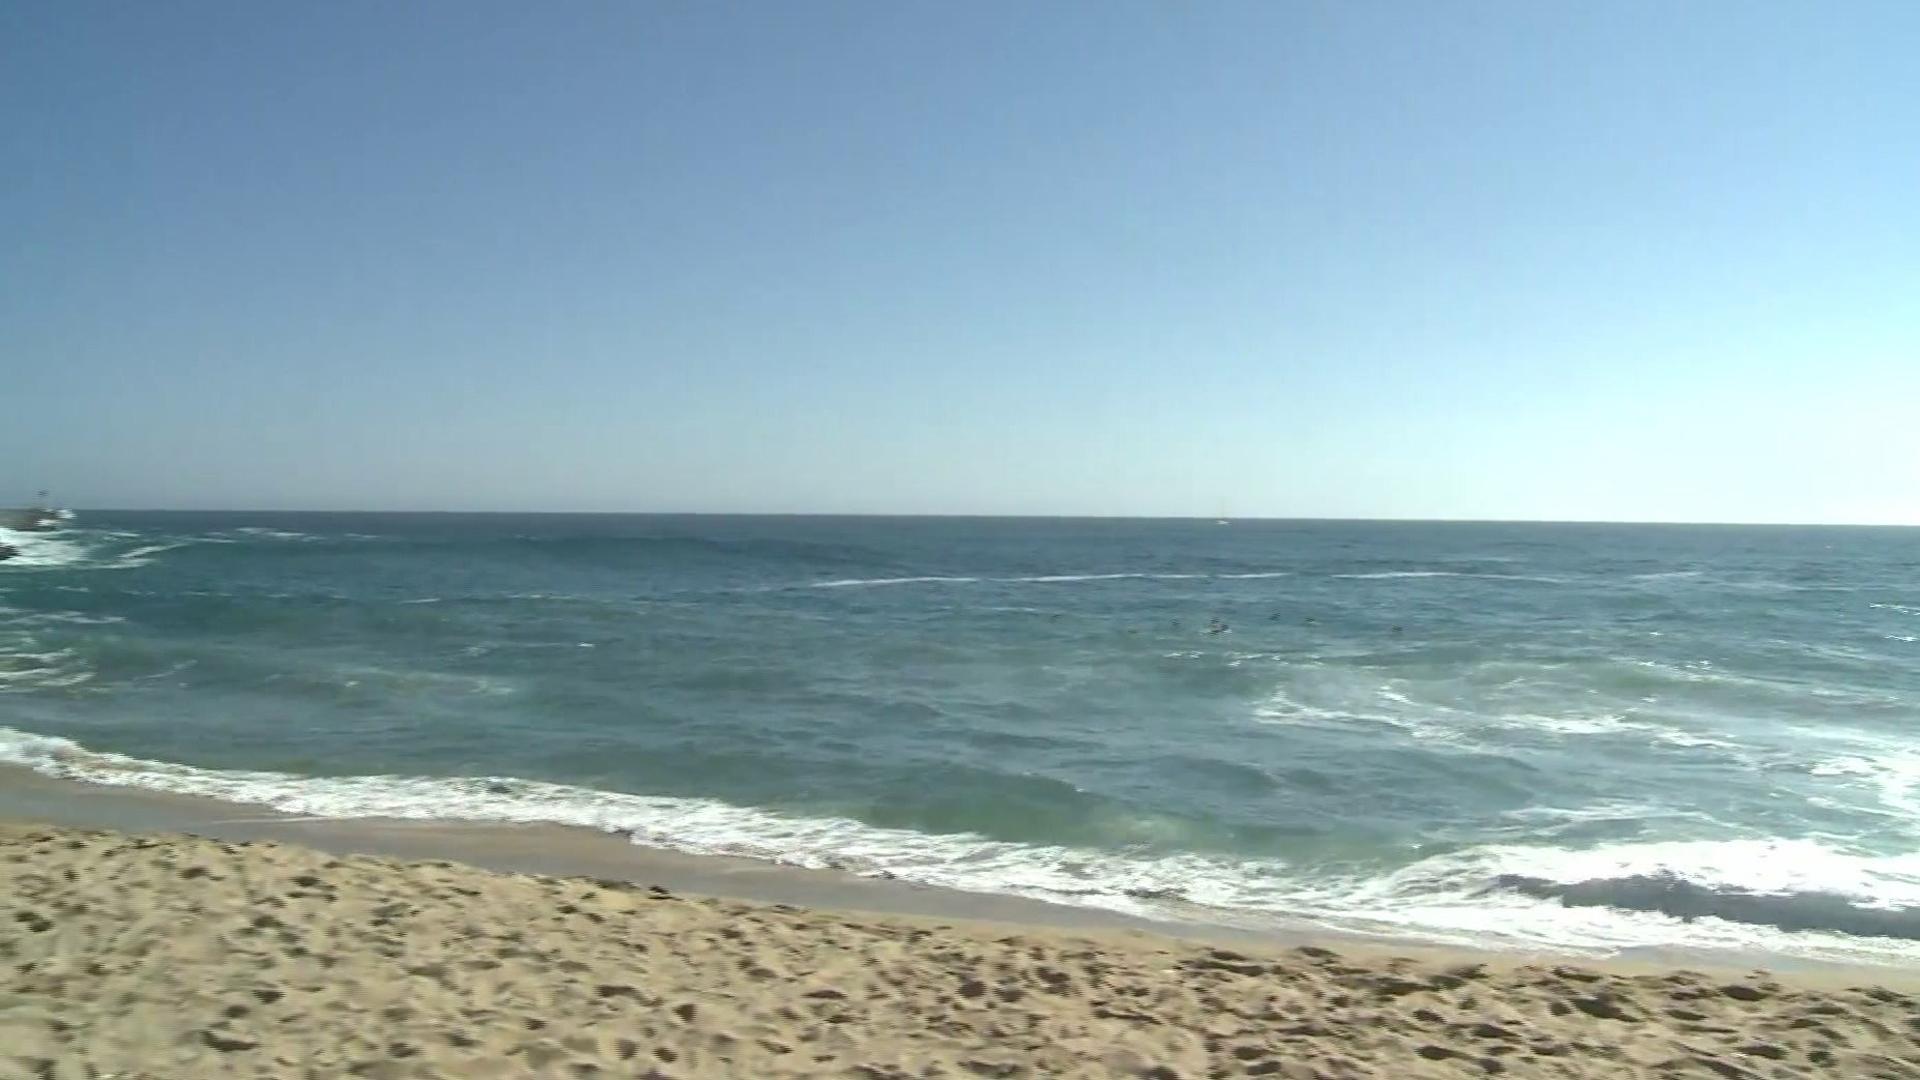 The ocean off of Newport Beach is seen in a file photo. (Credit: KTLA)